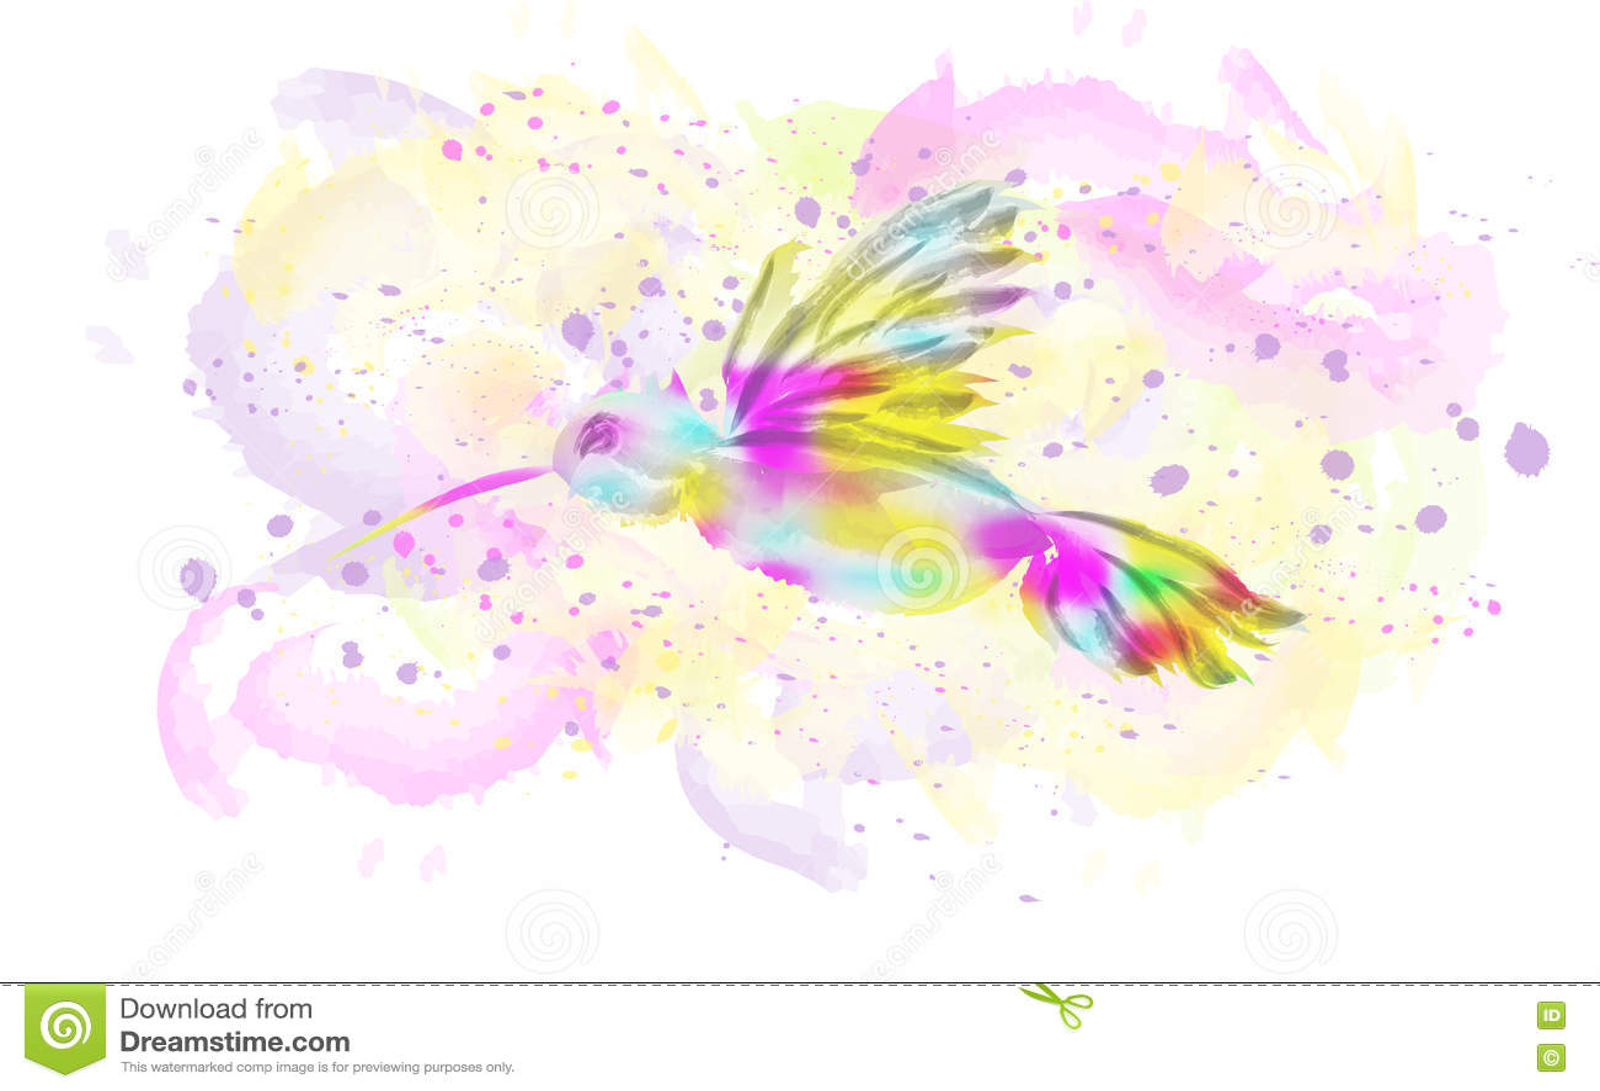 watercolor bird illustration stock vector image 75752002